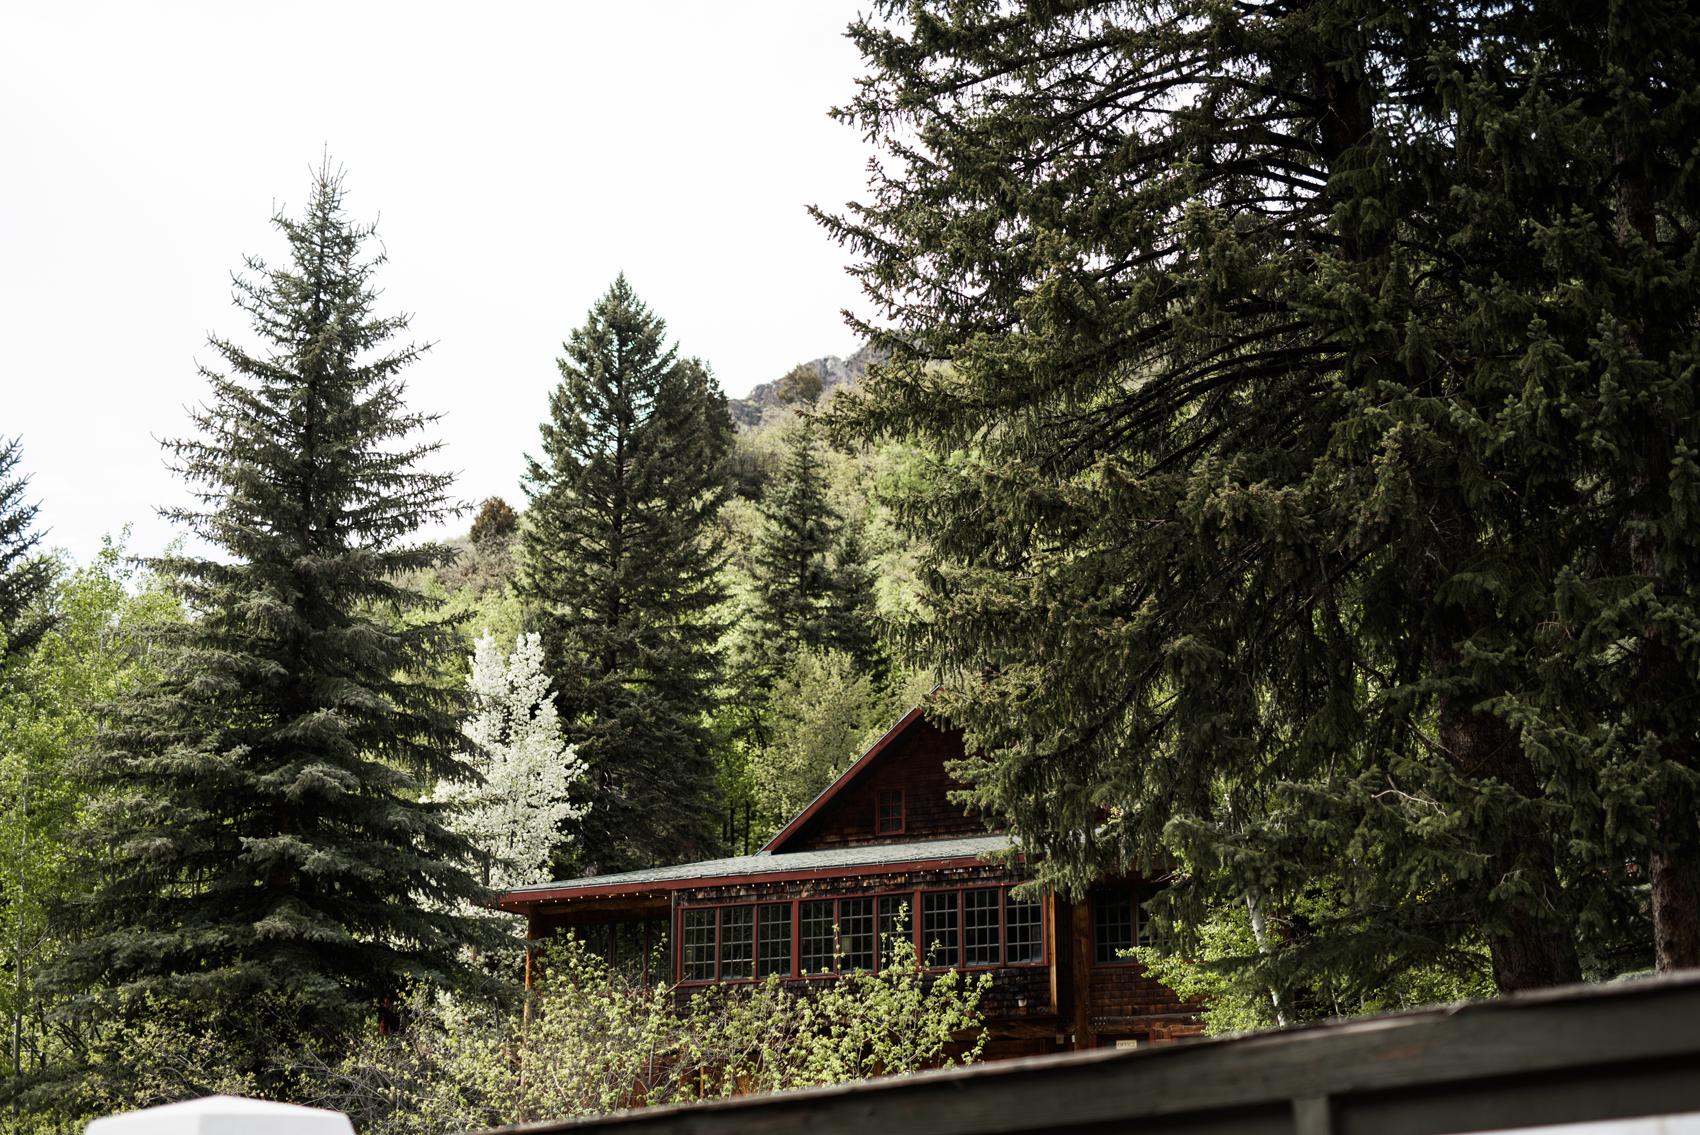 Wedding venue in Millcreek Canyon, Utah